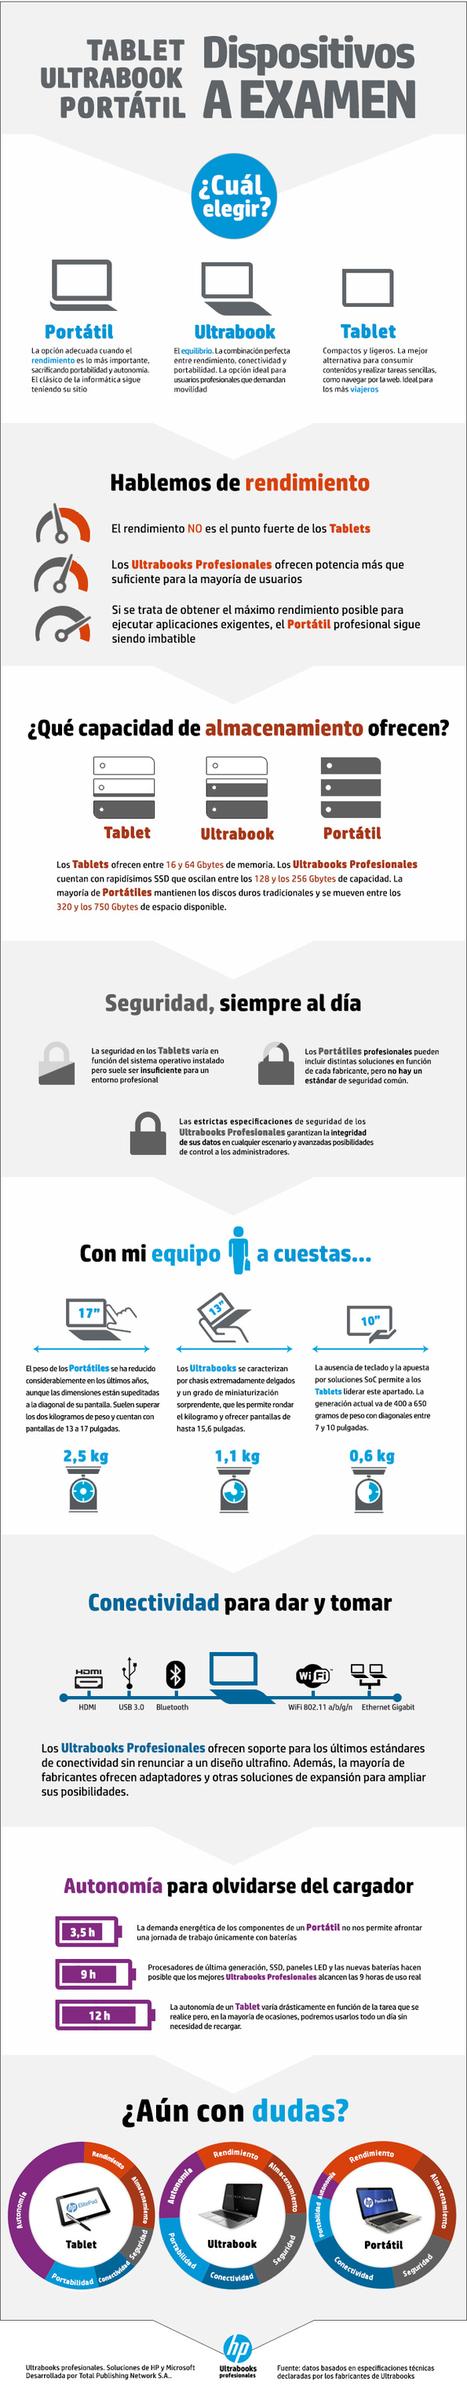 ¿Tablet, ultrabook o portátil? #infografia #infographic #tablets | INFORMÁTICA LOLA ARANDA | Scoop.it